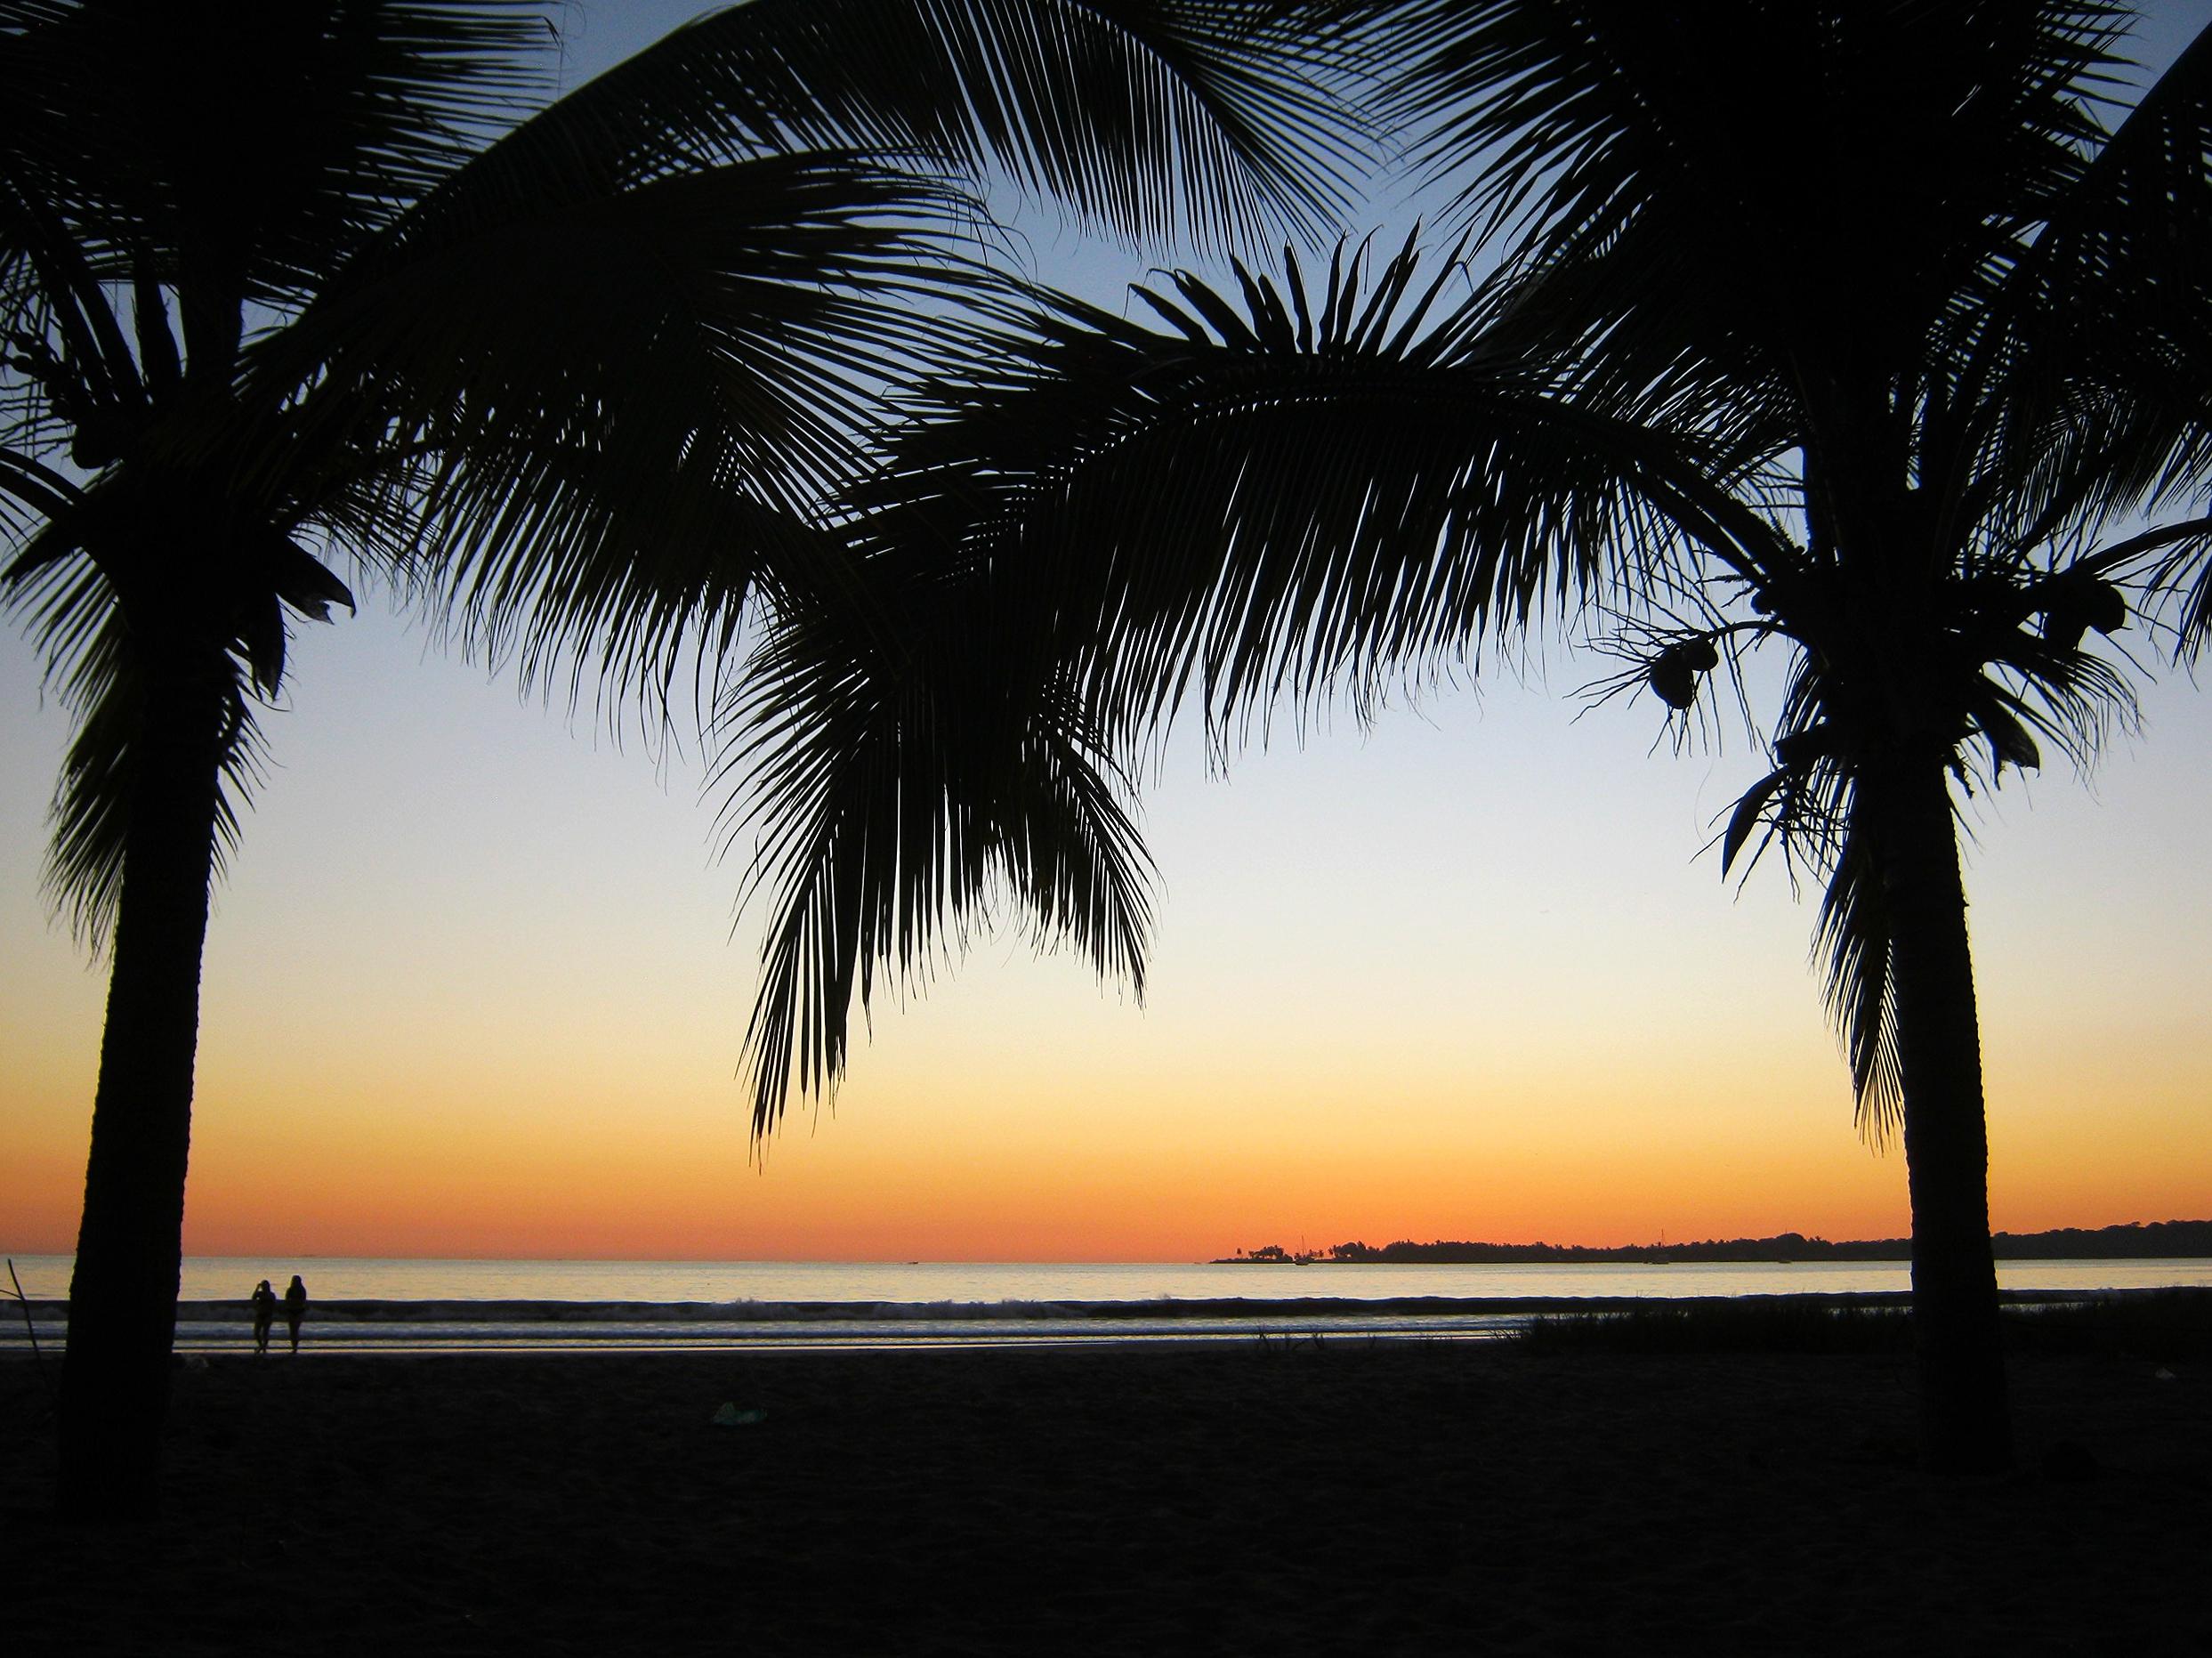 San Blas, Riviera Nayarit